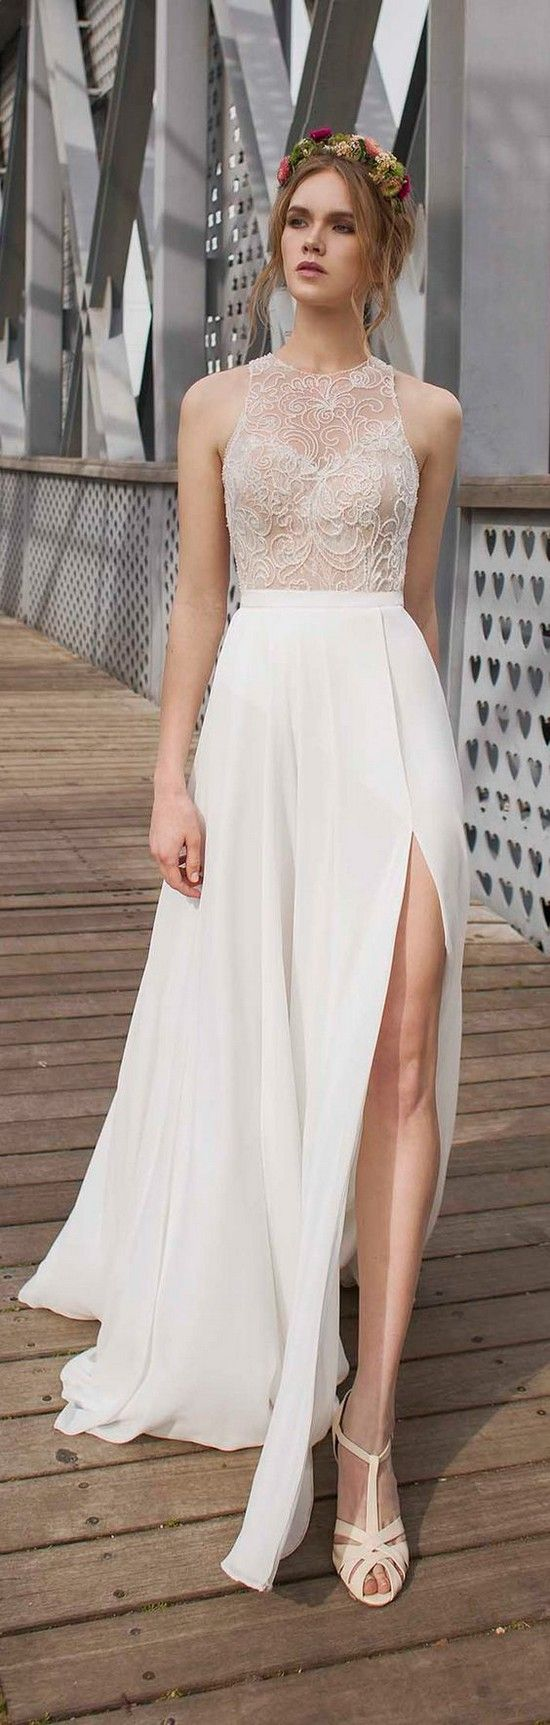 Limor Rosen Beach Wedding Dresses - Deer Pearl Flowers